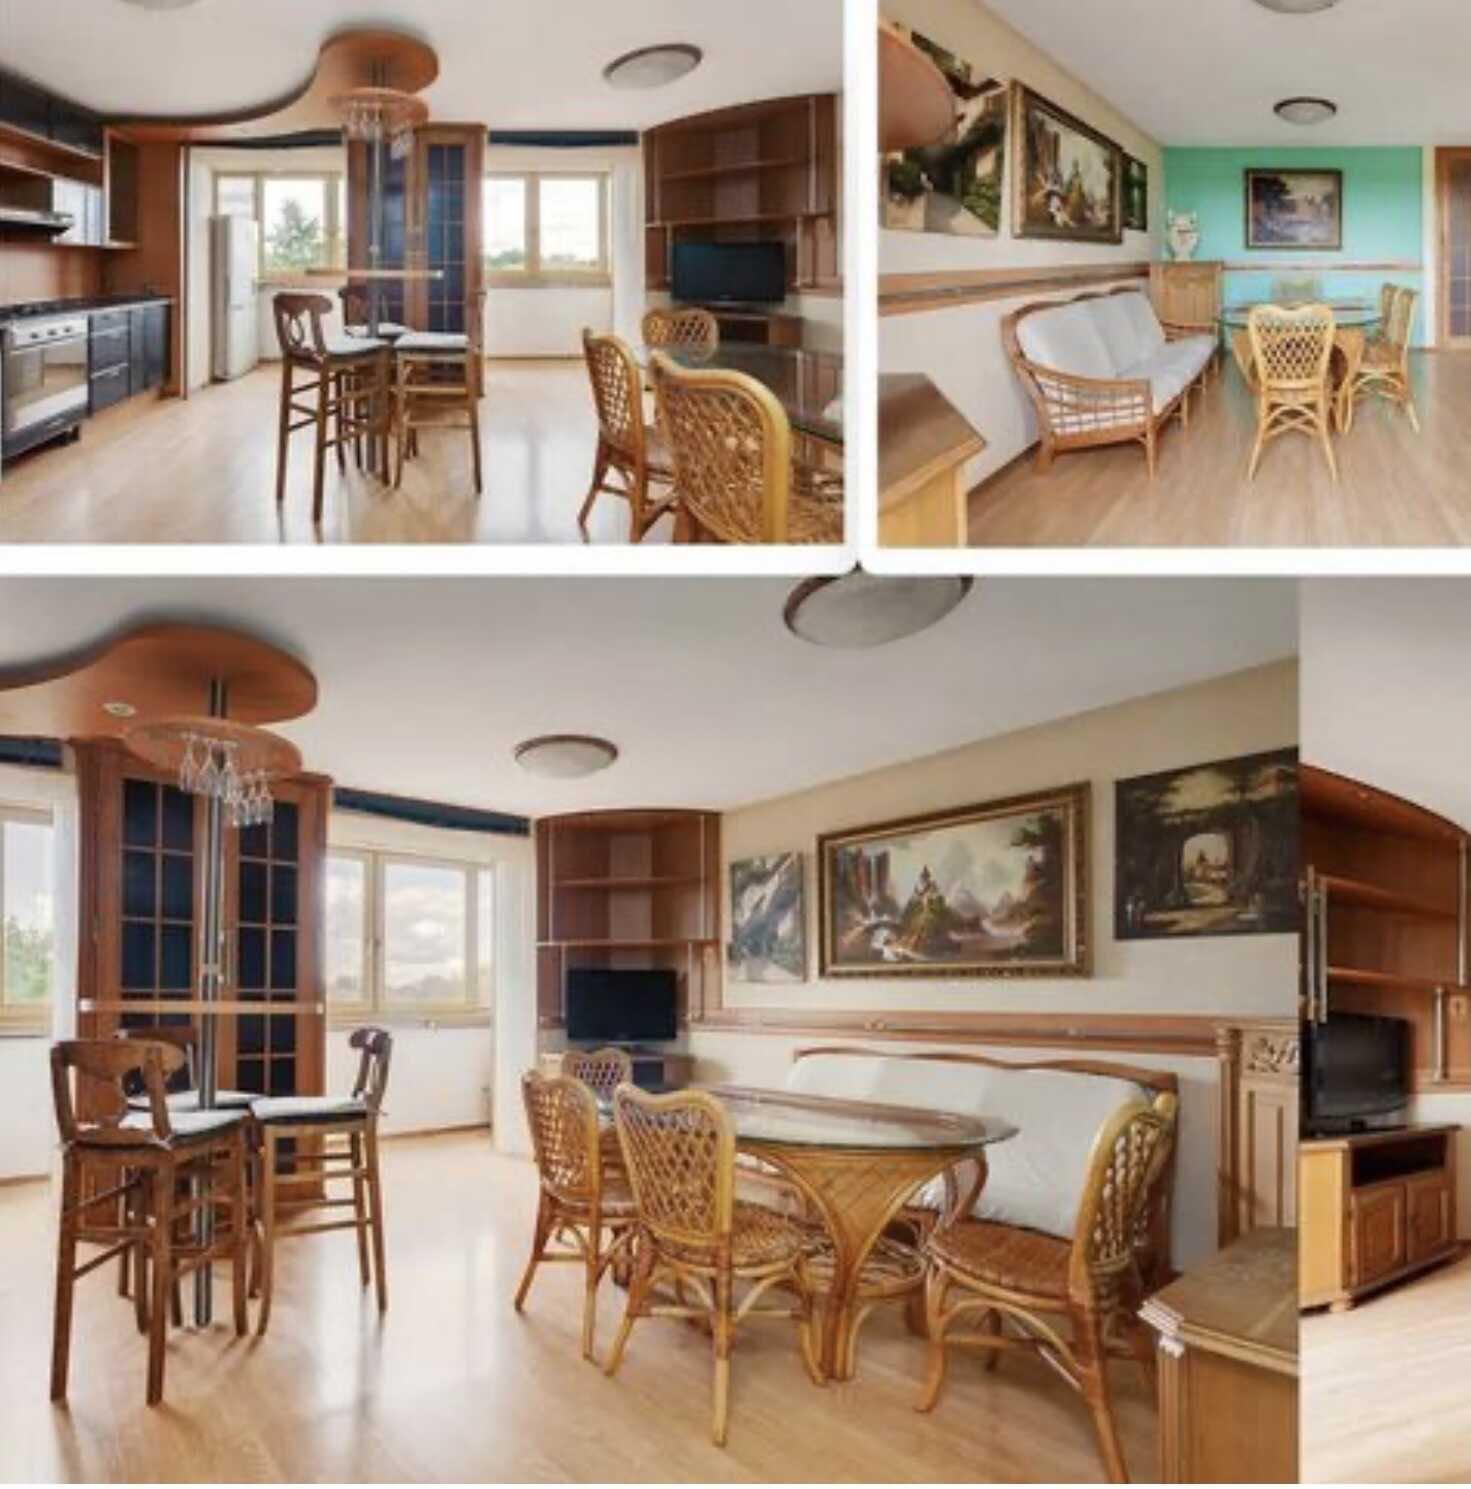 Alexander Serov urgently sells an elite apartment near the Kremlin